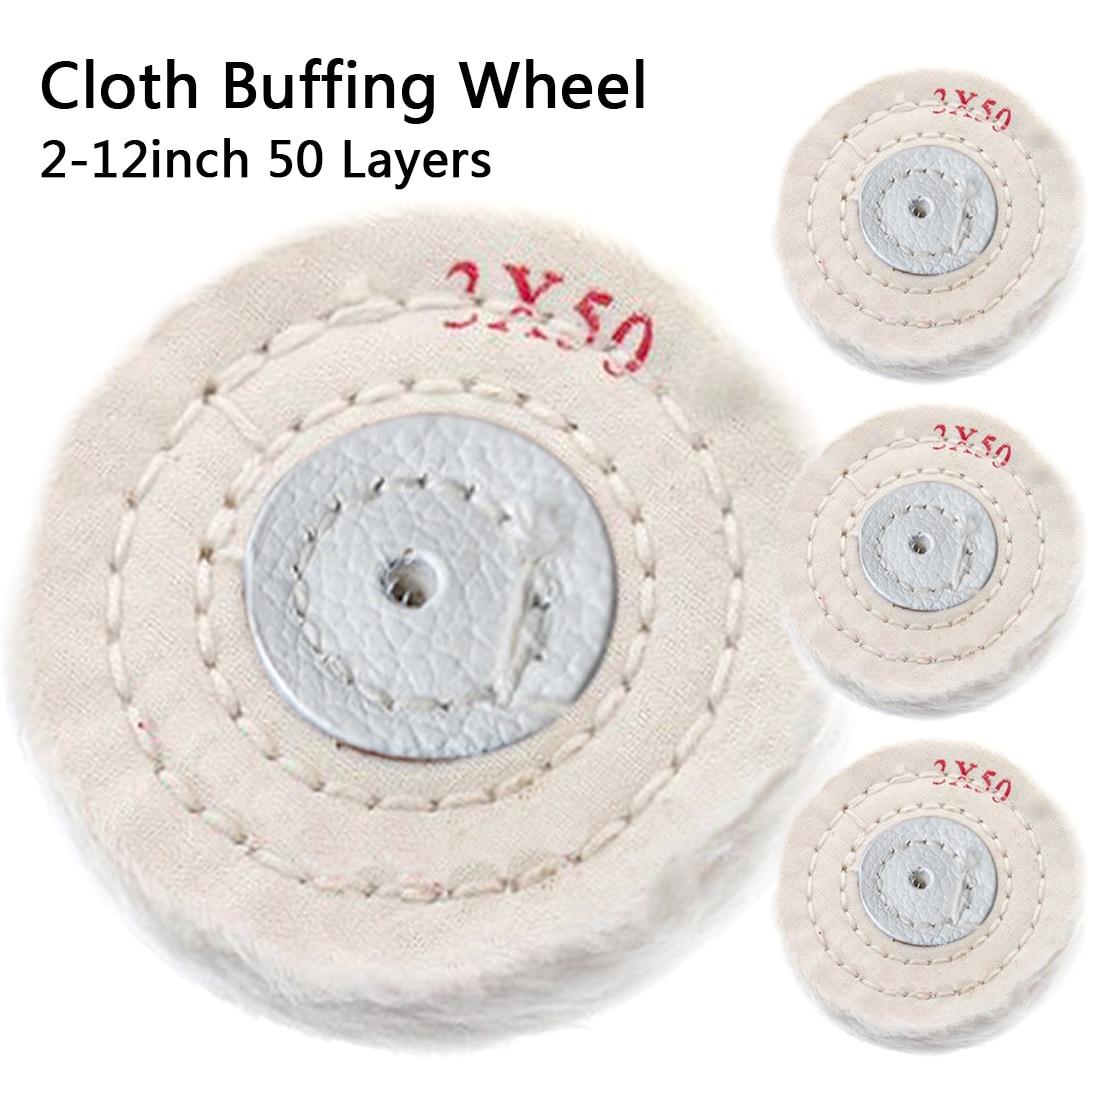 Cotton Polishing Wheel Cloth Buffing Wheel 2-12 Inch Arbor Buffer Mirror Polish White Round Wheel 50 Layers Abrasive Tools